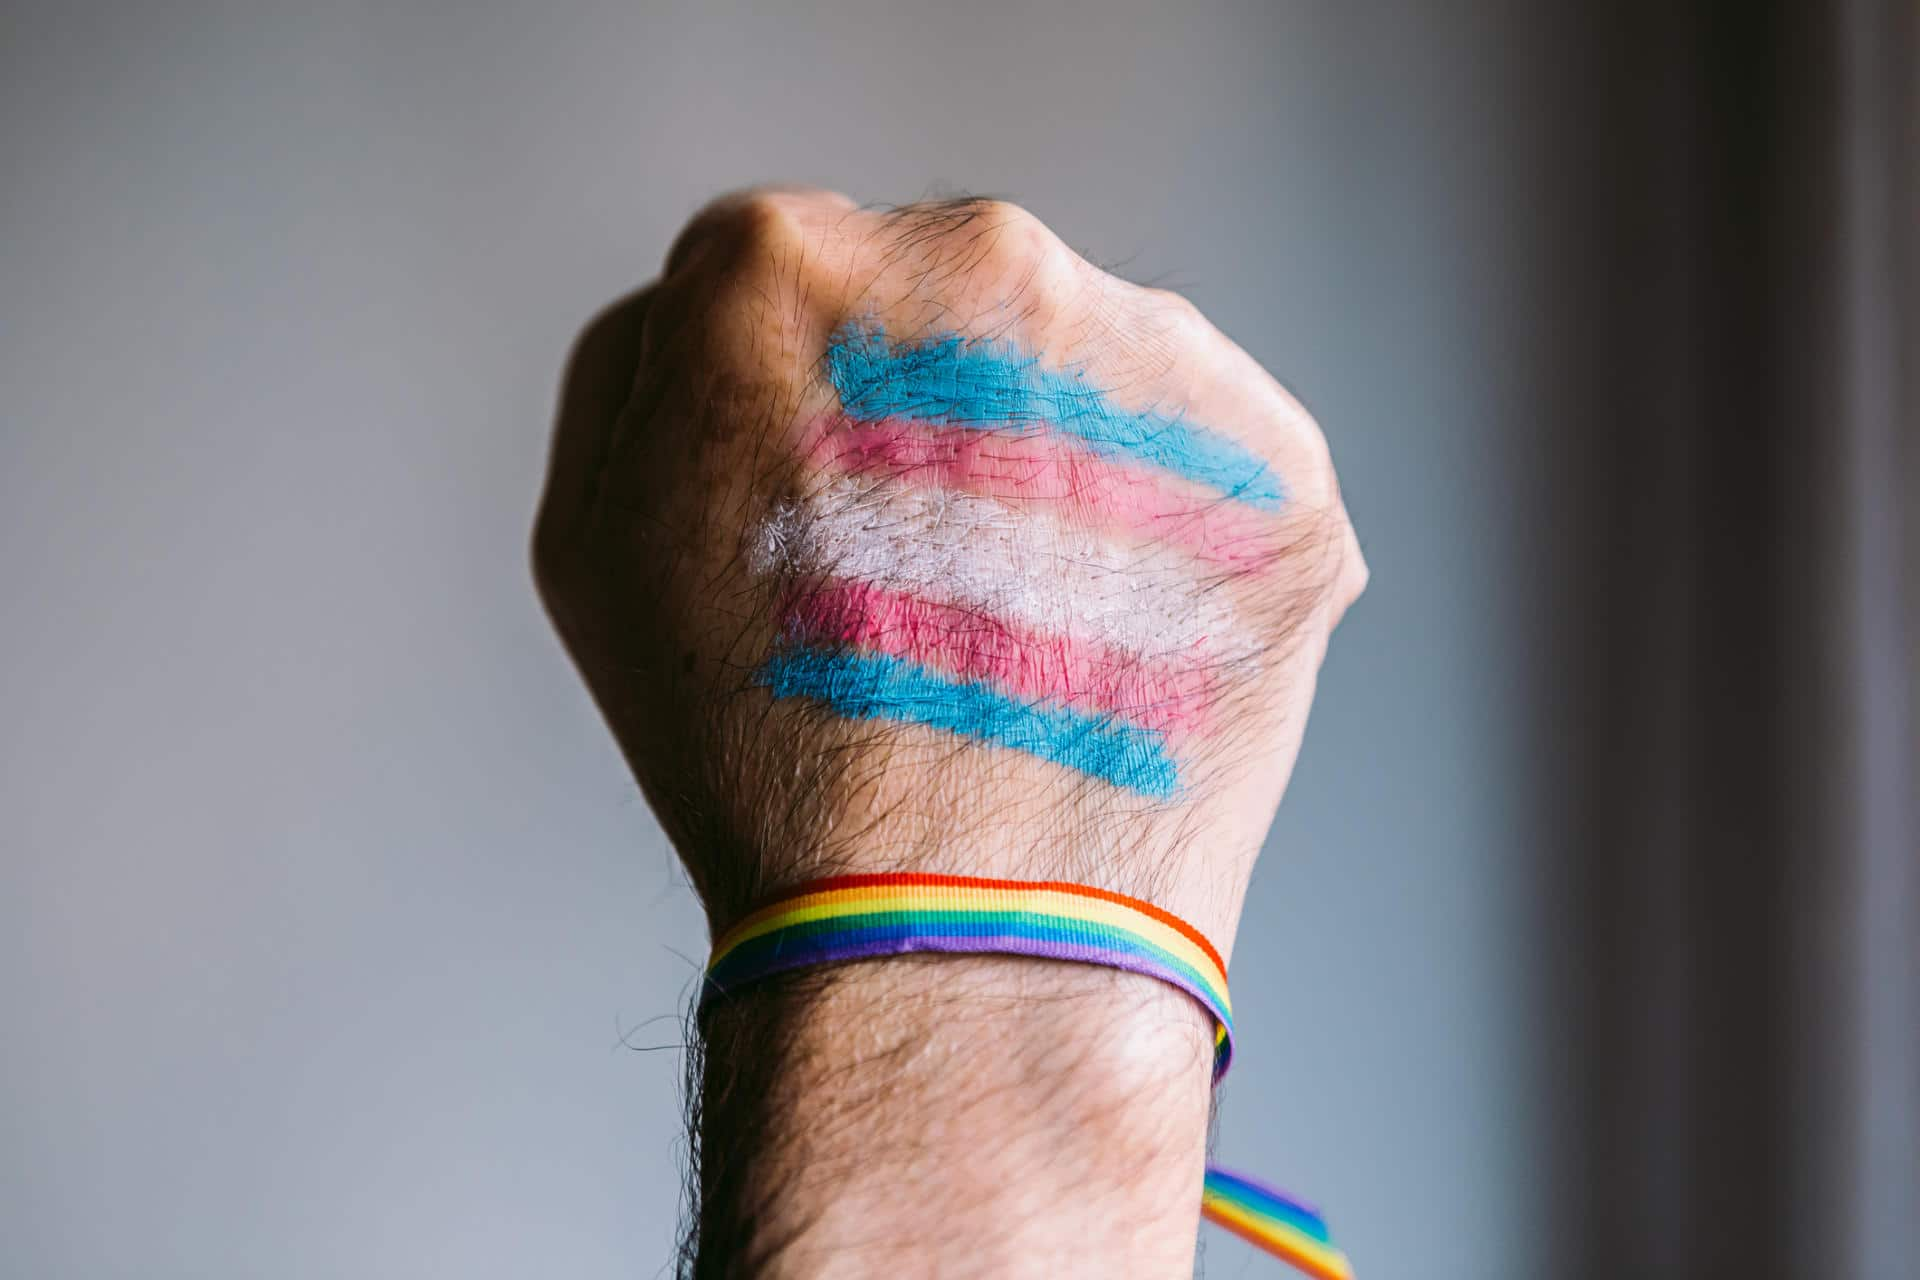 EU måste agera kraftfullt mot den tjeckiske presidentens transfobi